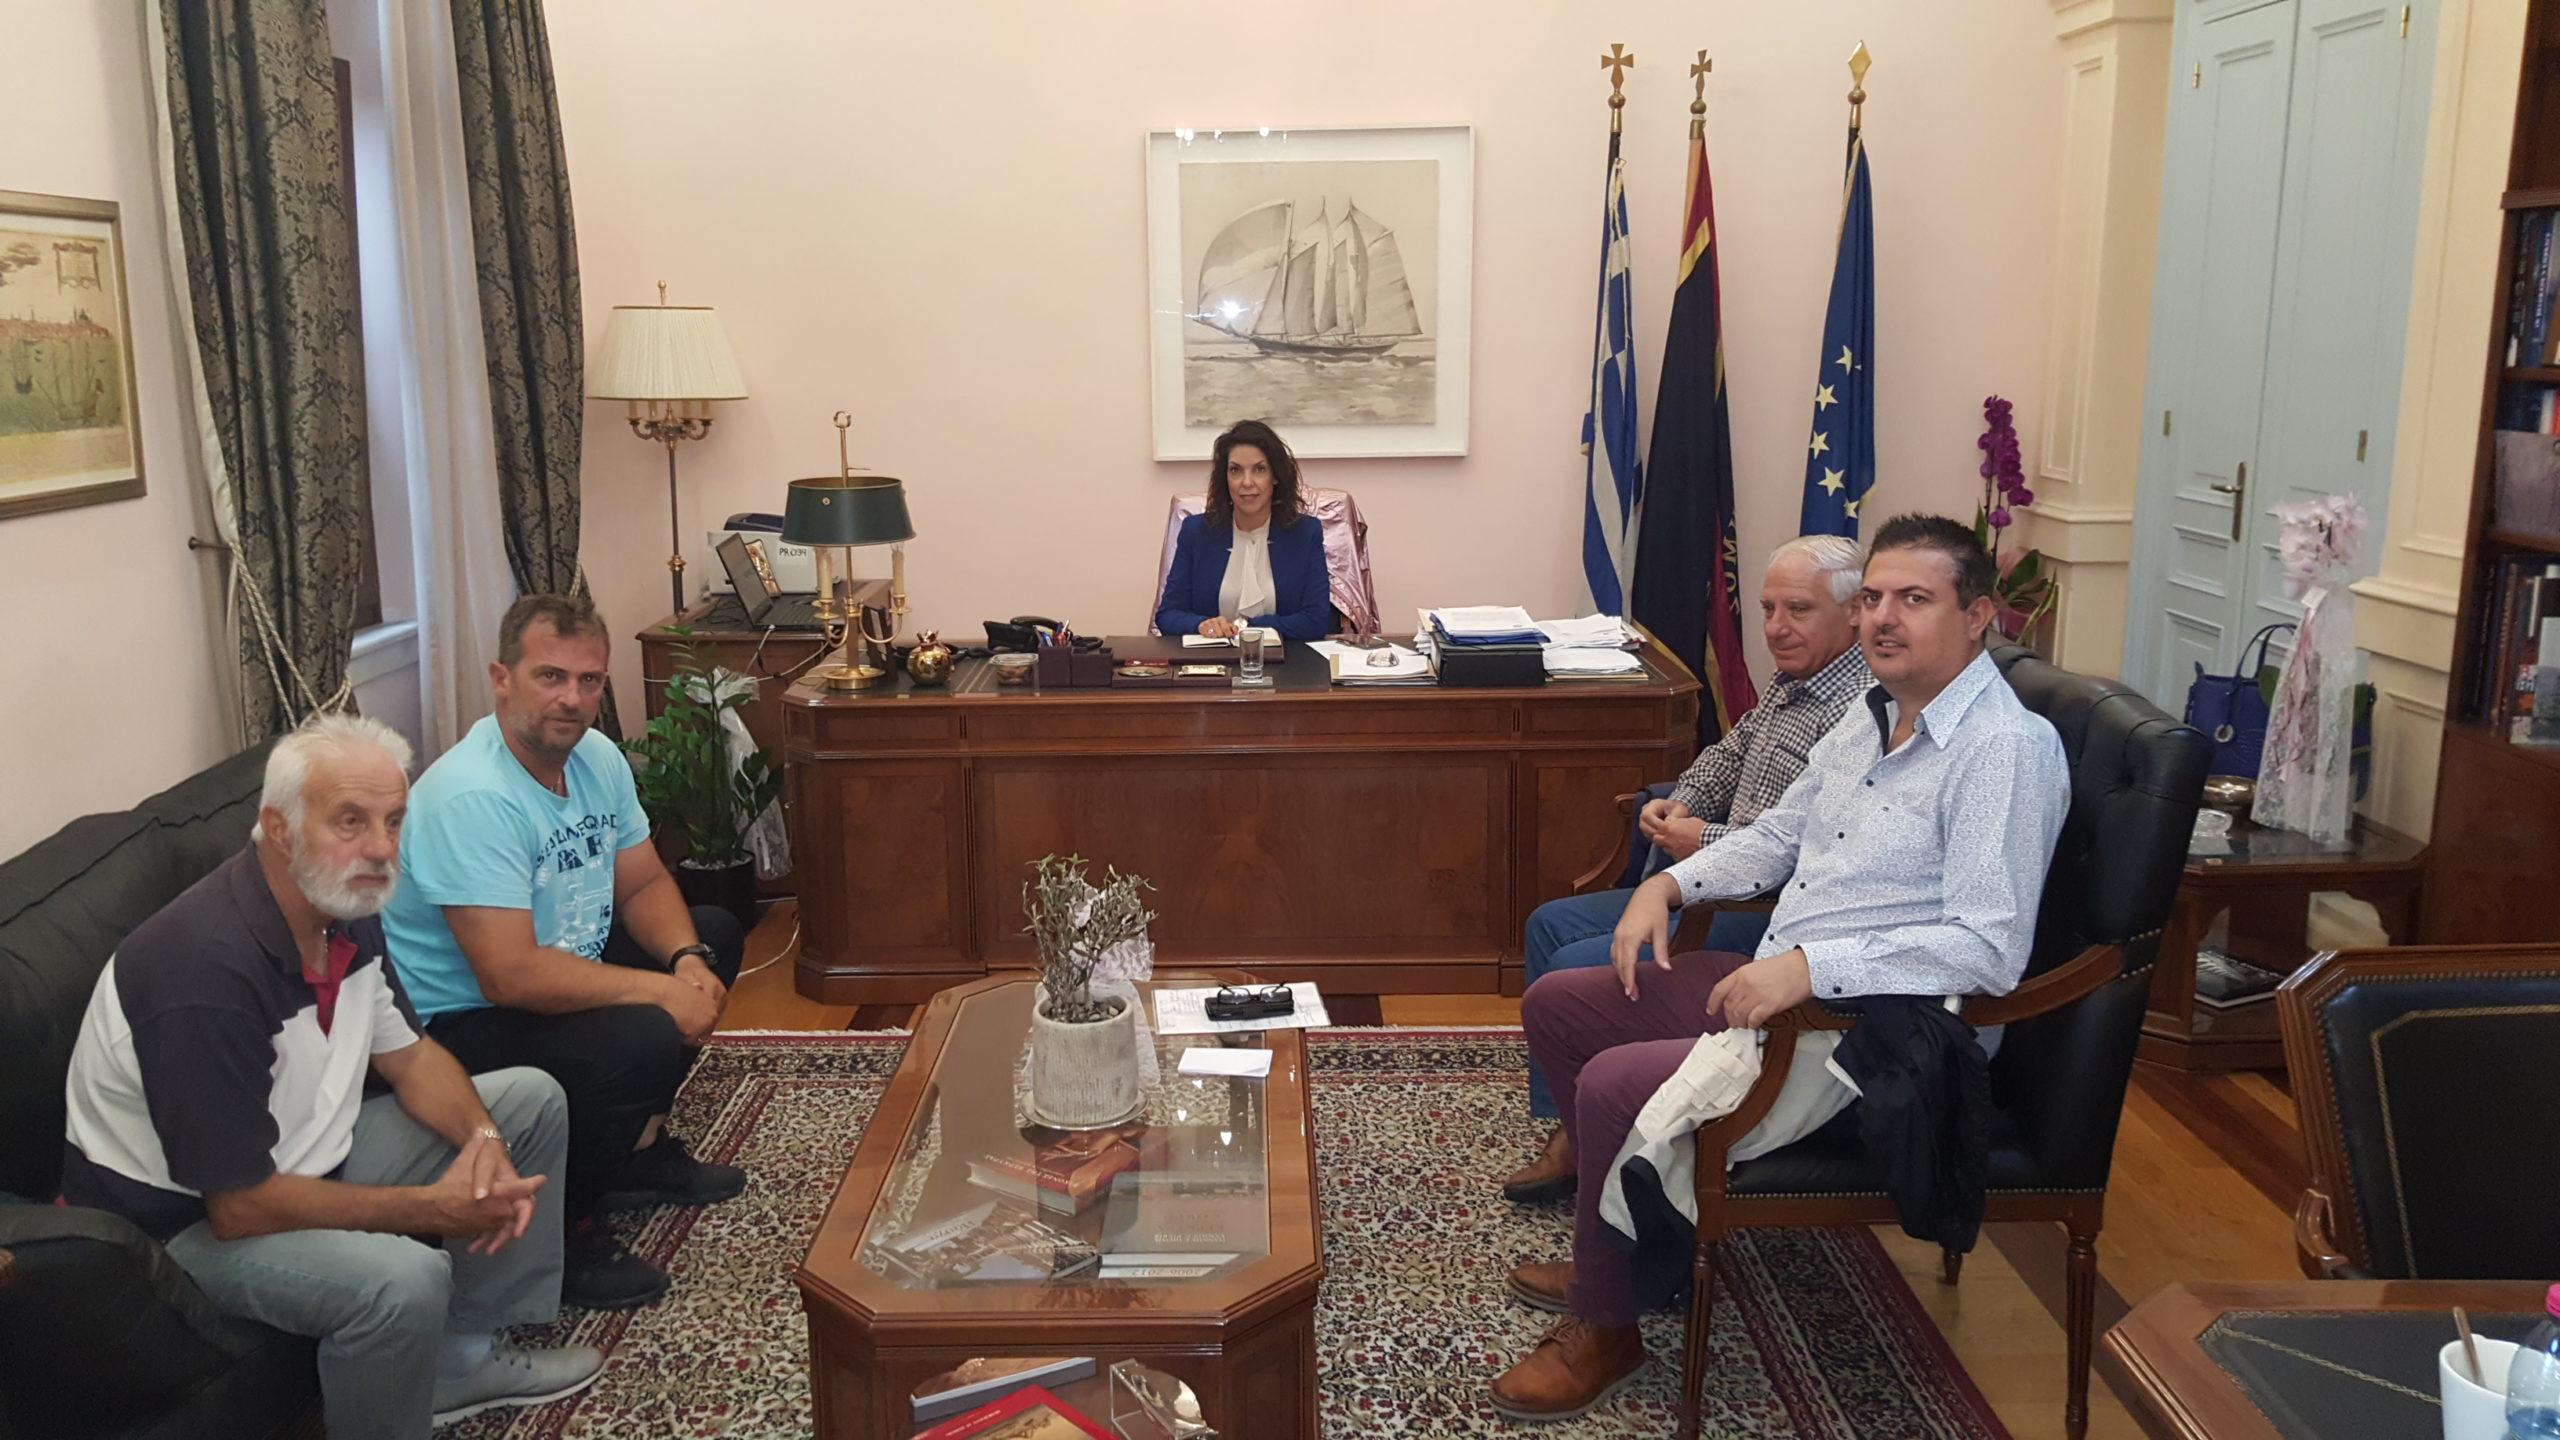 corfu.gr-2020-06-05_09-37-01_333295